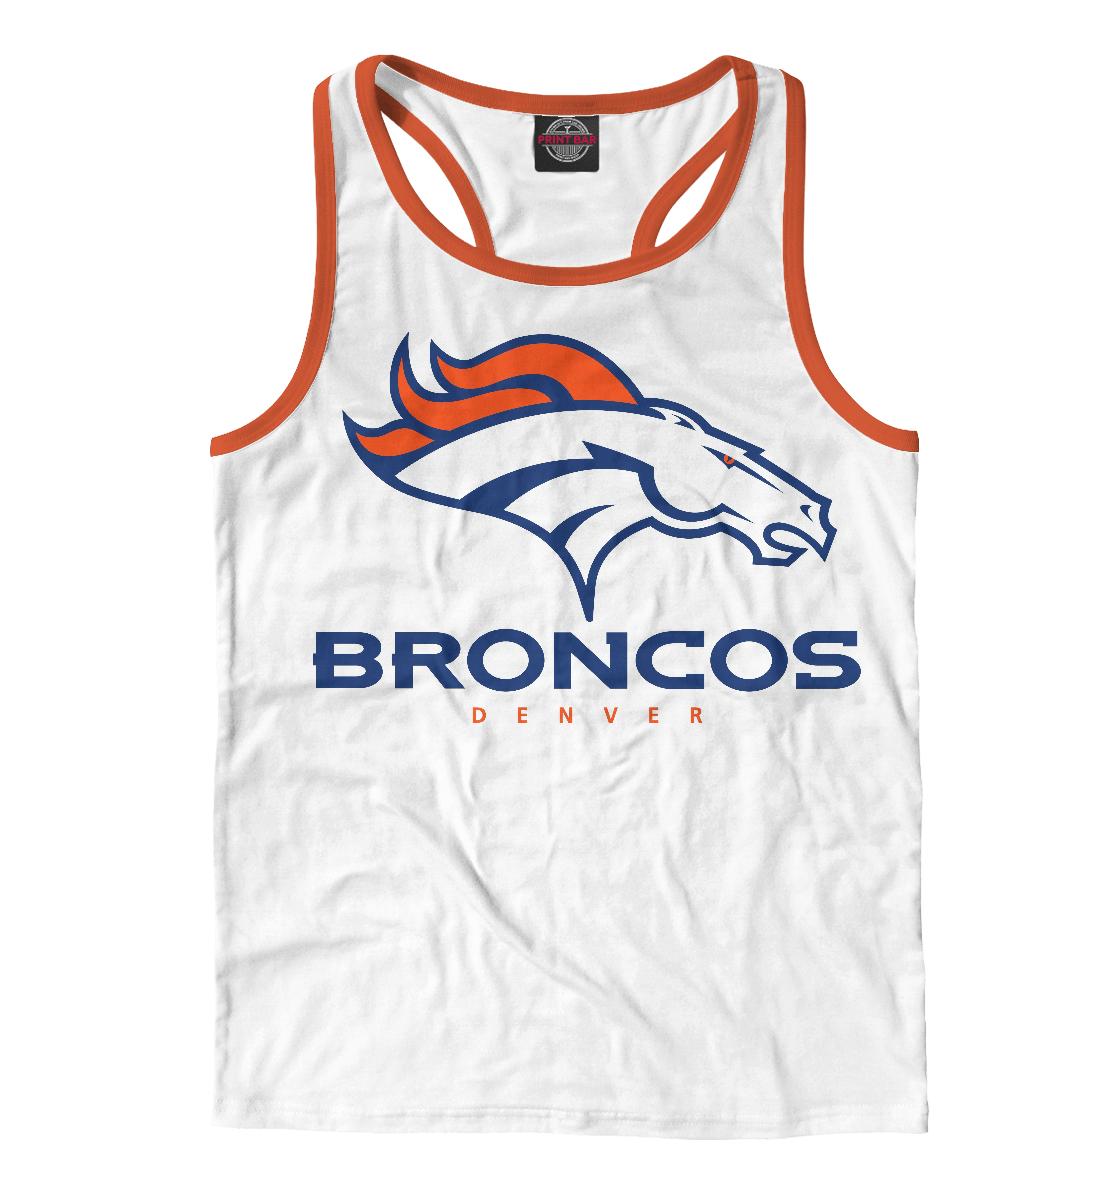 Купить Denver Broncos - Денвер Бронкос, Printbar, Майки борцовки, APD-335785-mayb-2